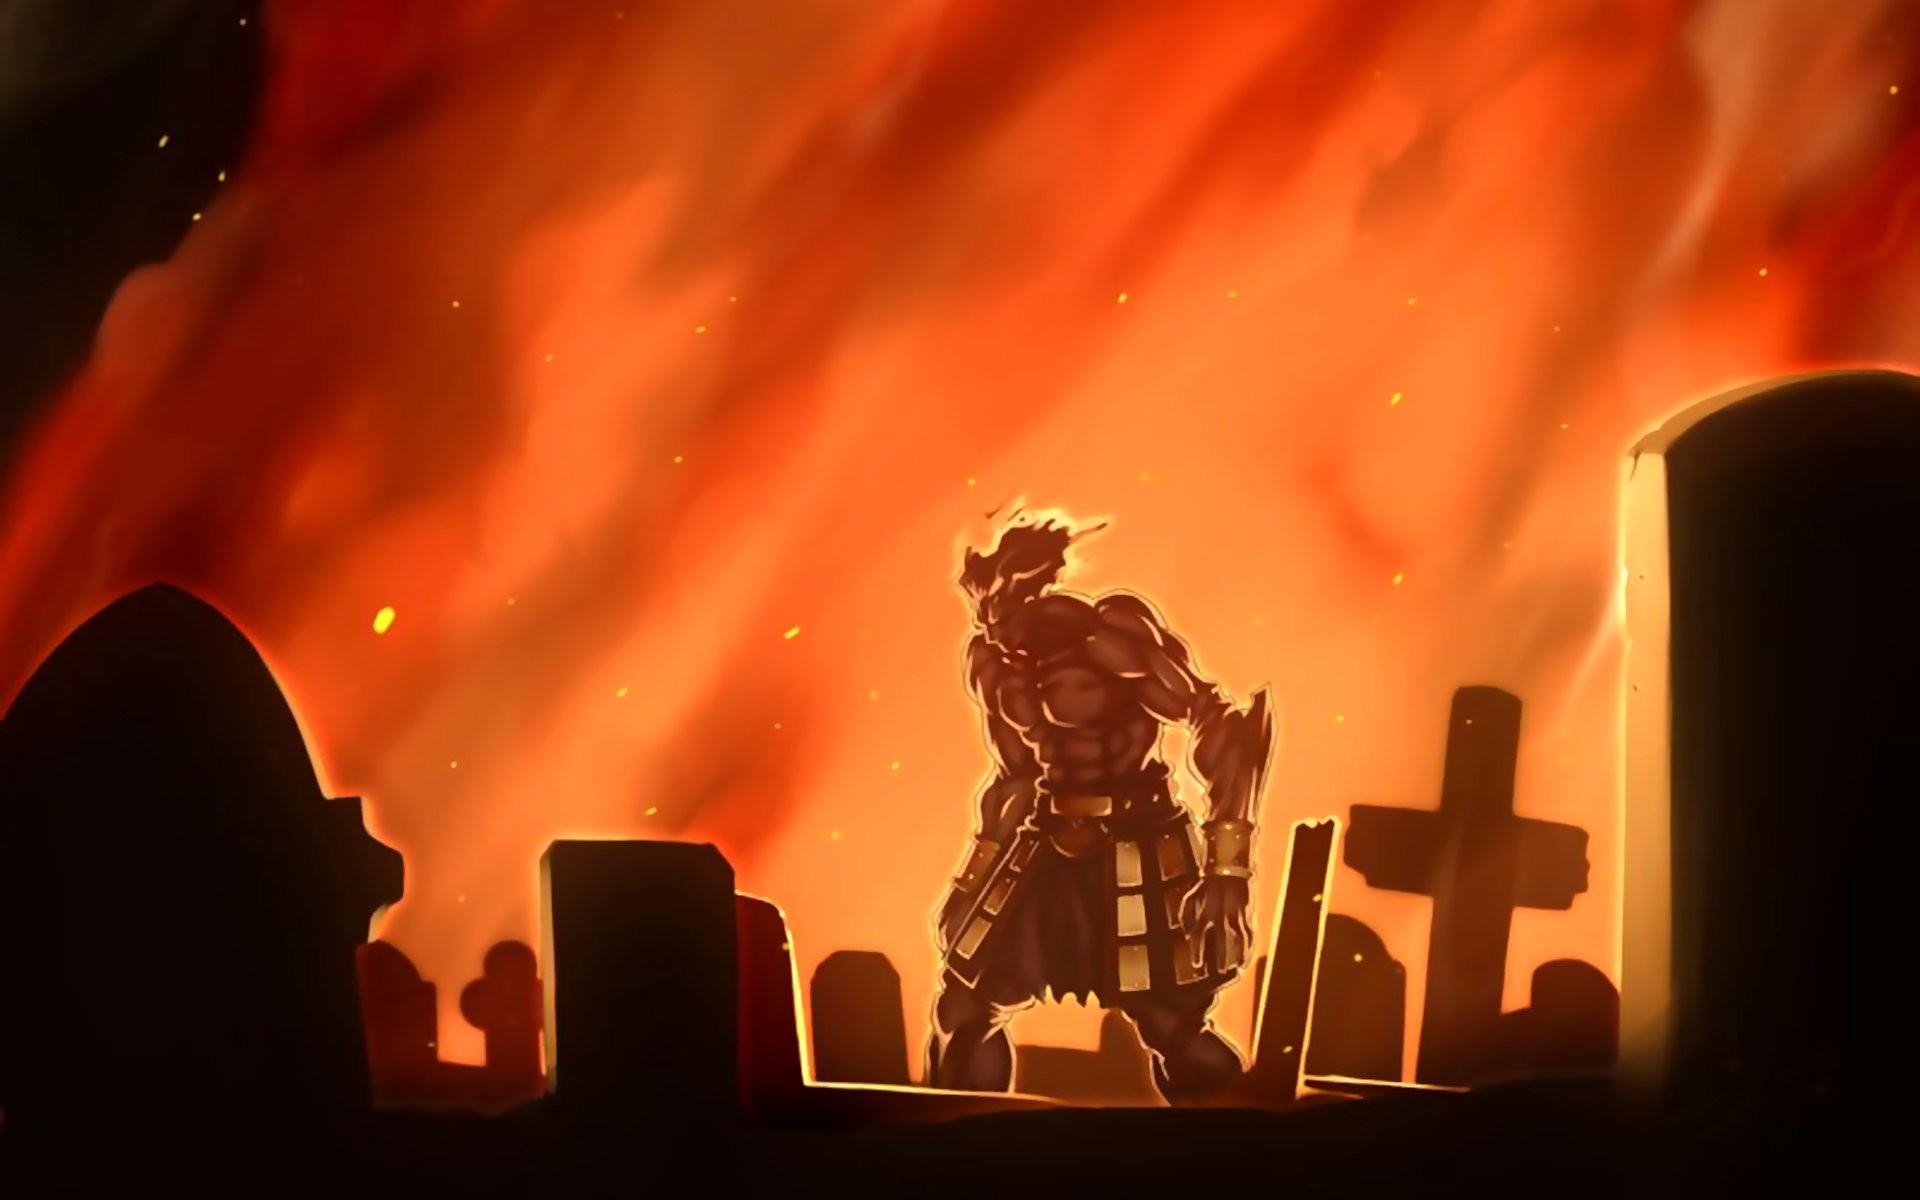 Anime – Fate/Stay Night Berserker (Fate/stay night) Wallpaper